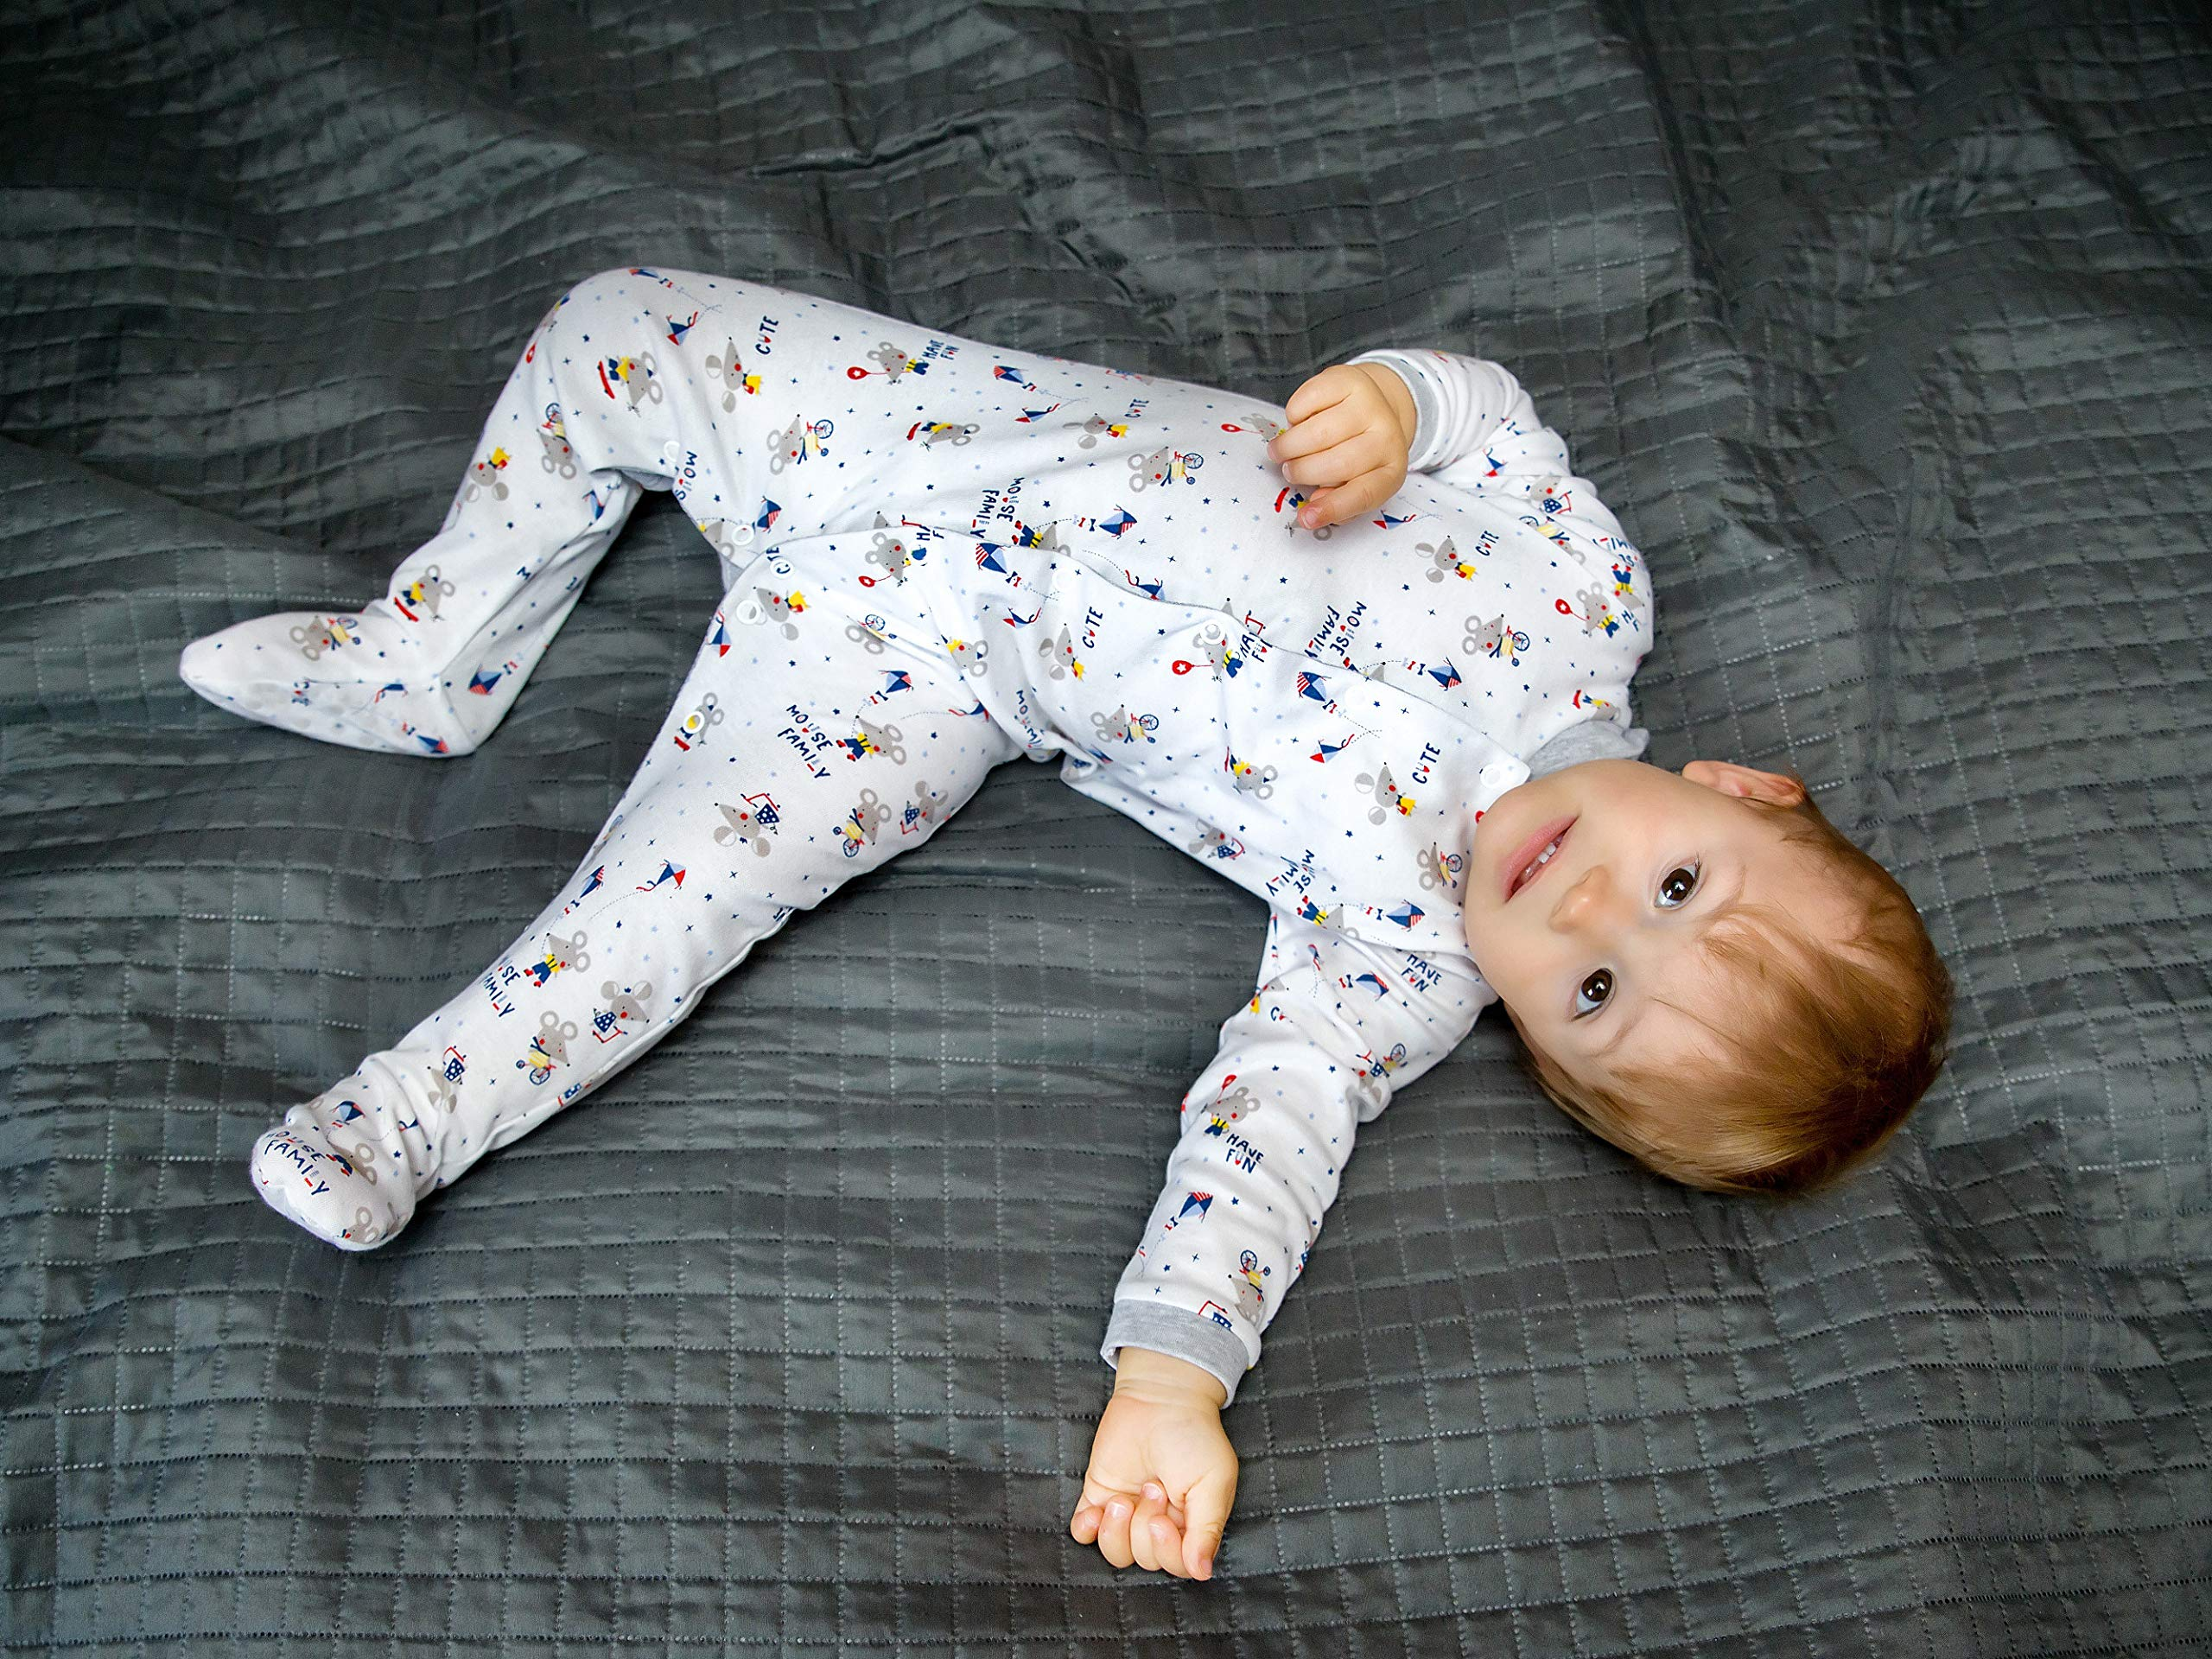 Sibinulo Niño Niña Pijama Bebé Pelele de ABS -Tamaños 80-92 - Pack de 4 5